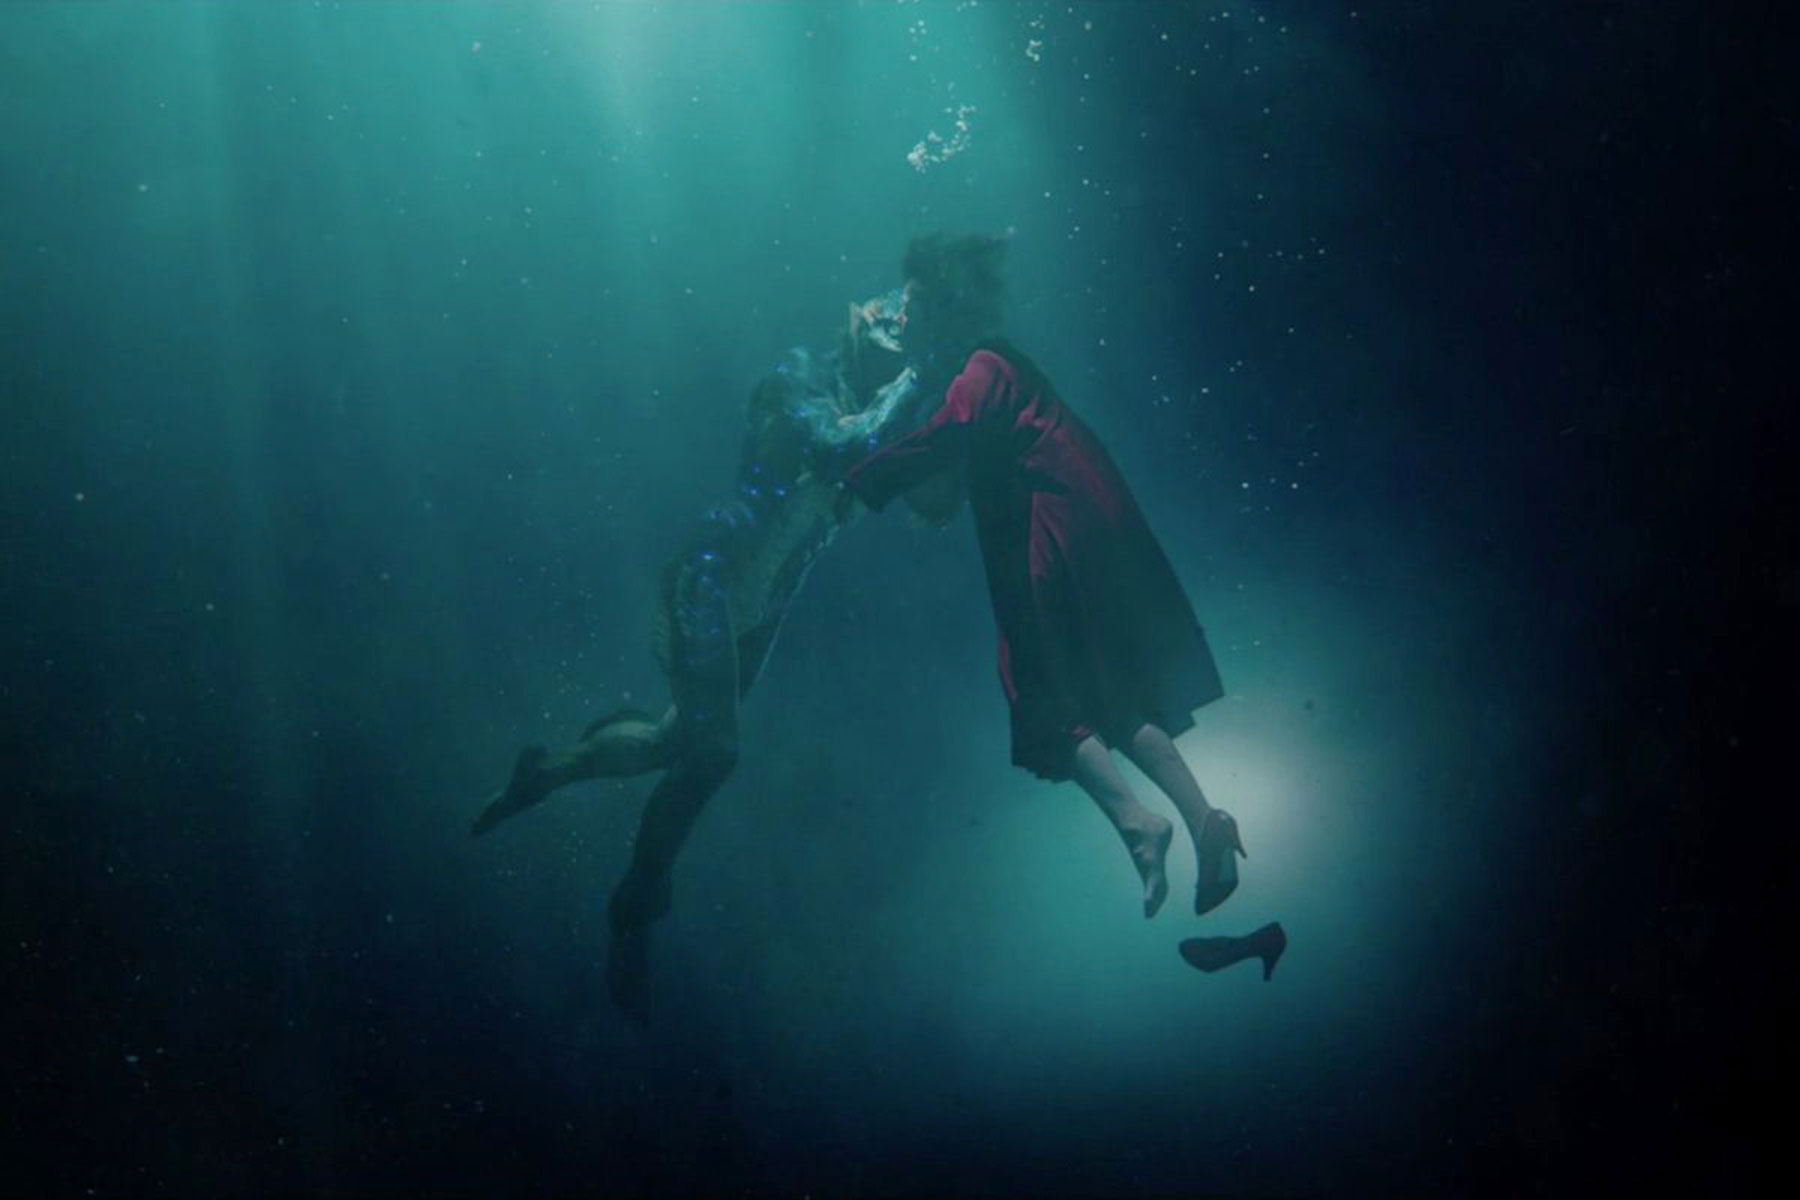 Amphibious Pelicula second annual cinelatino film festival to feature guillermo